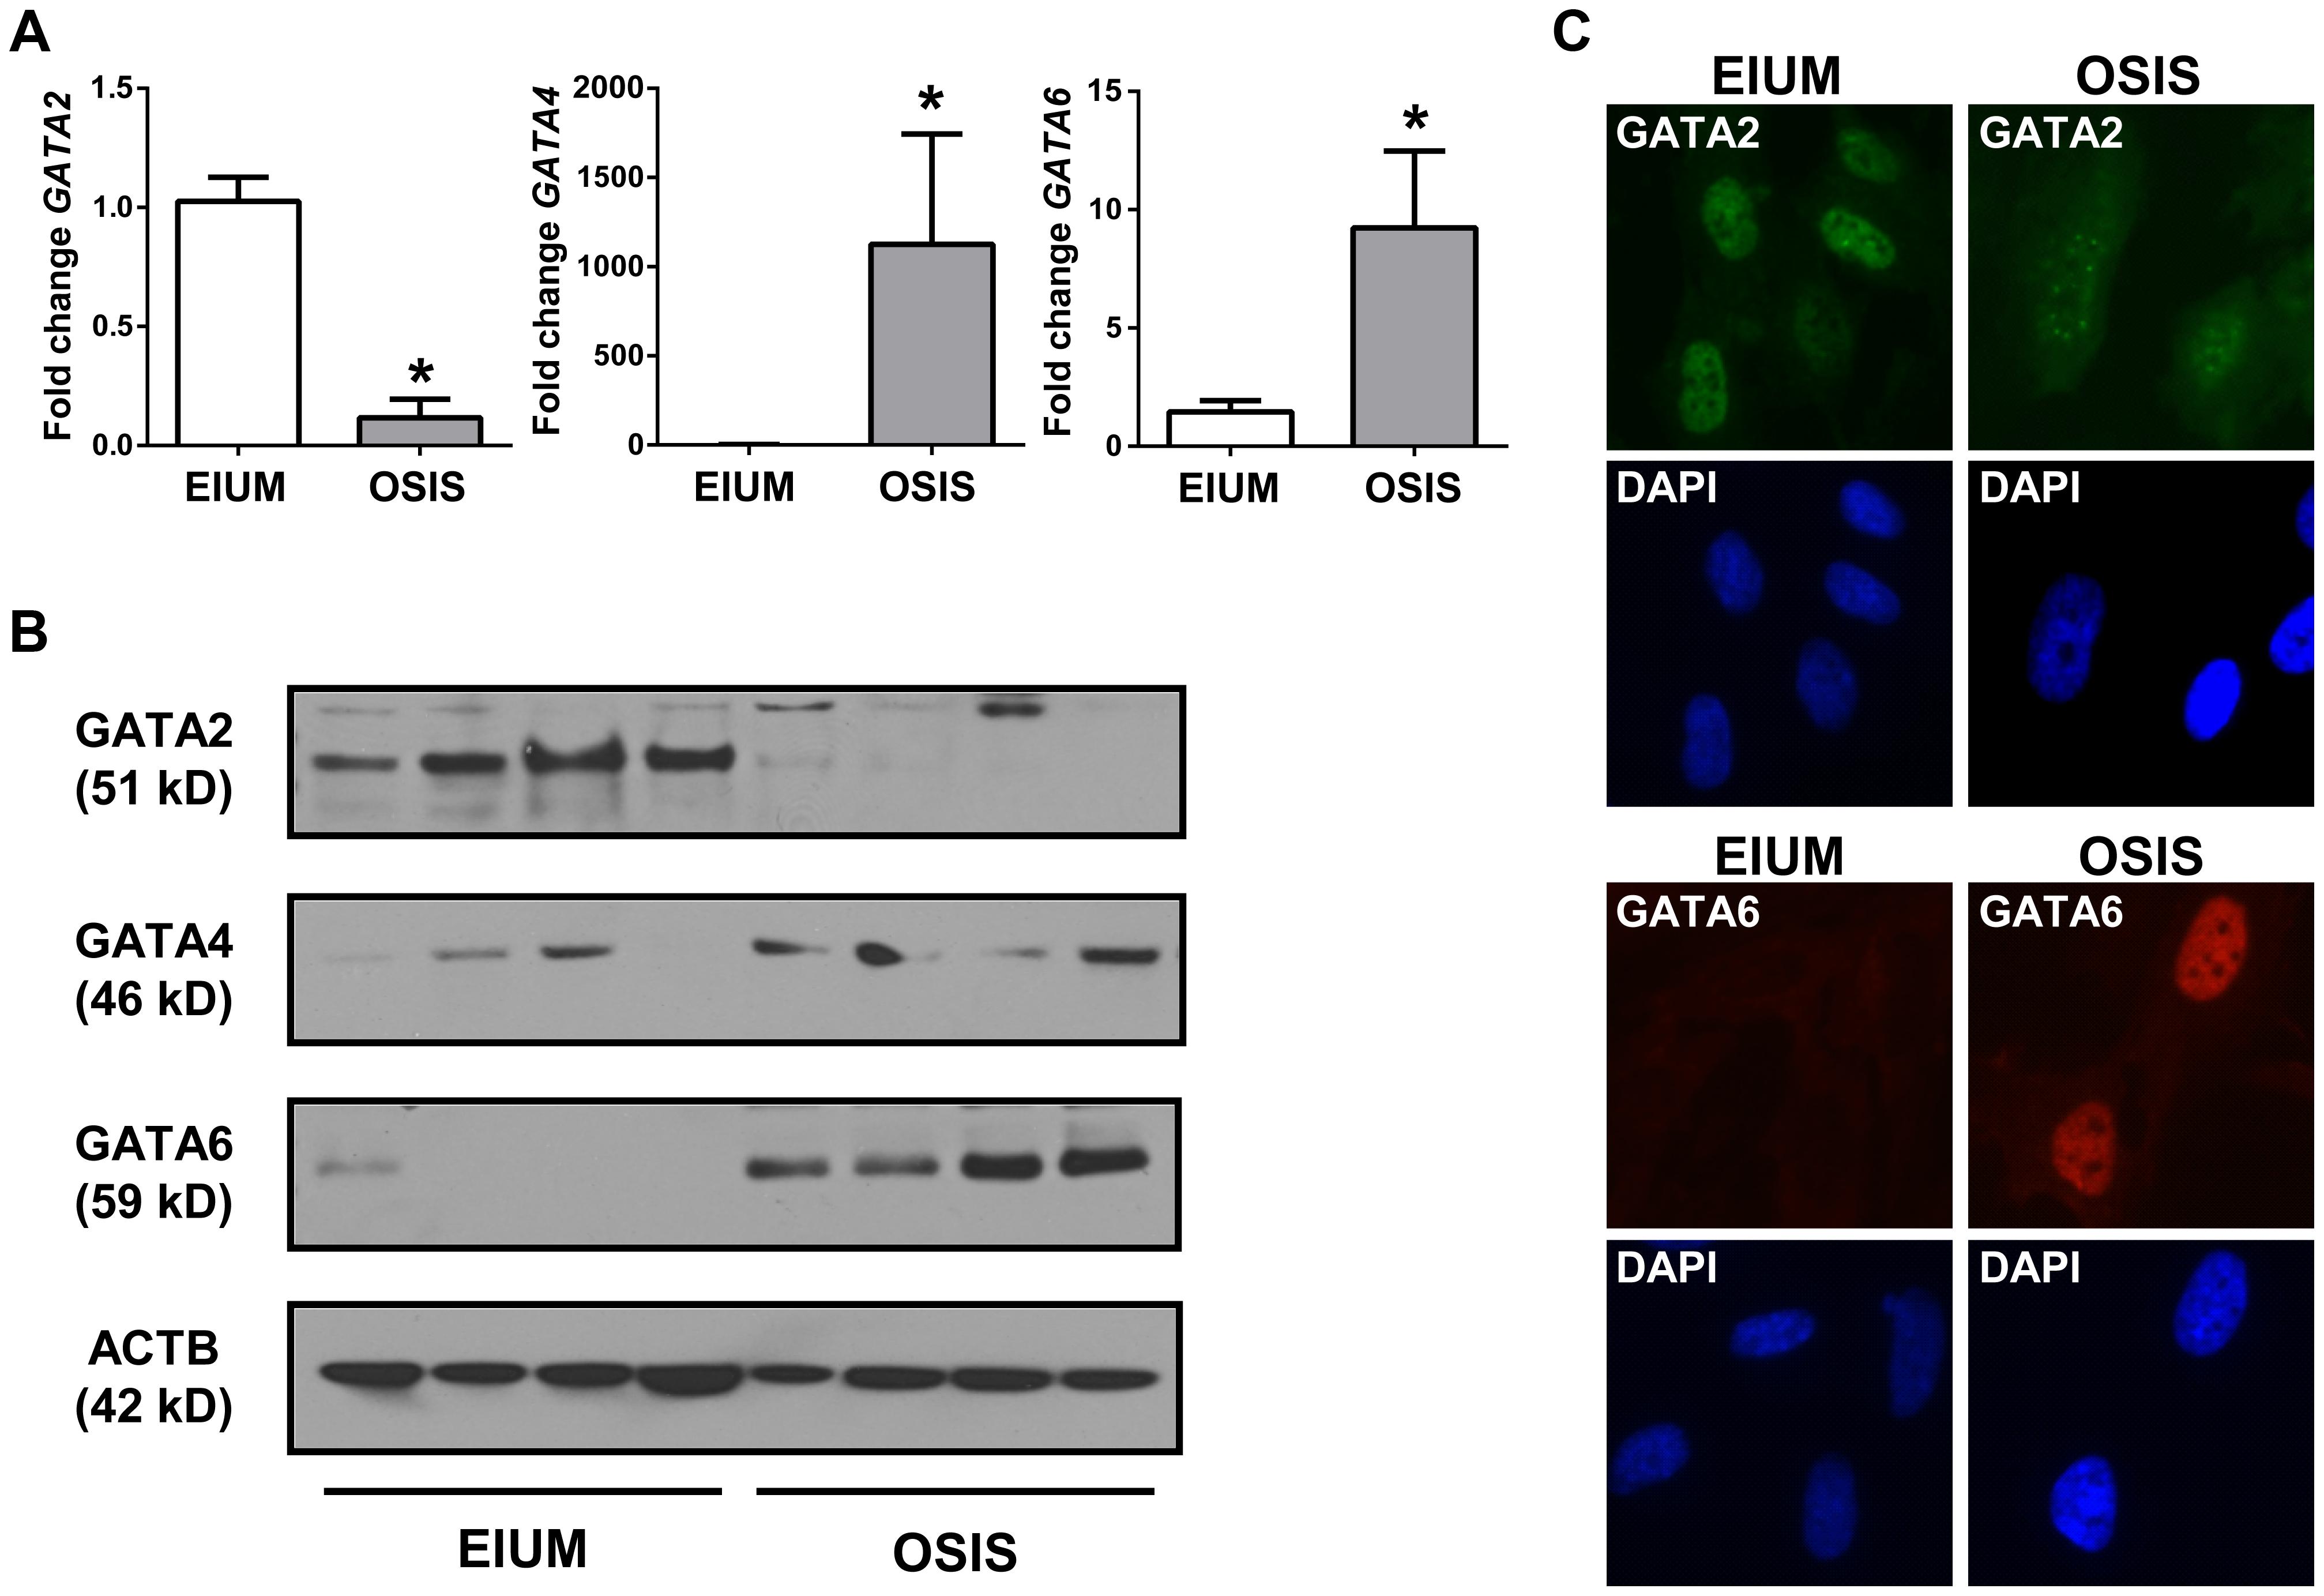 GATA isoform expression in stromal cells.